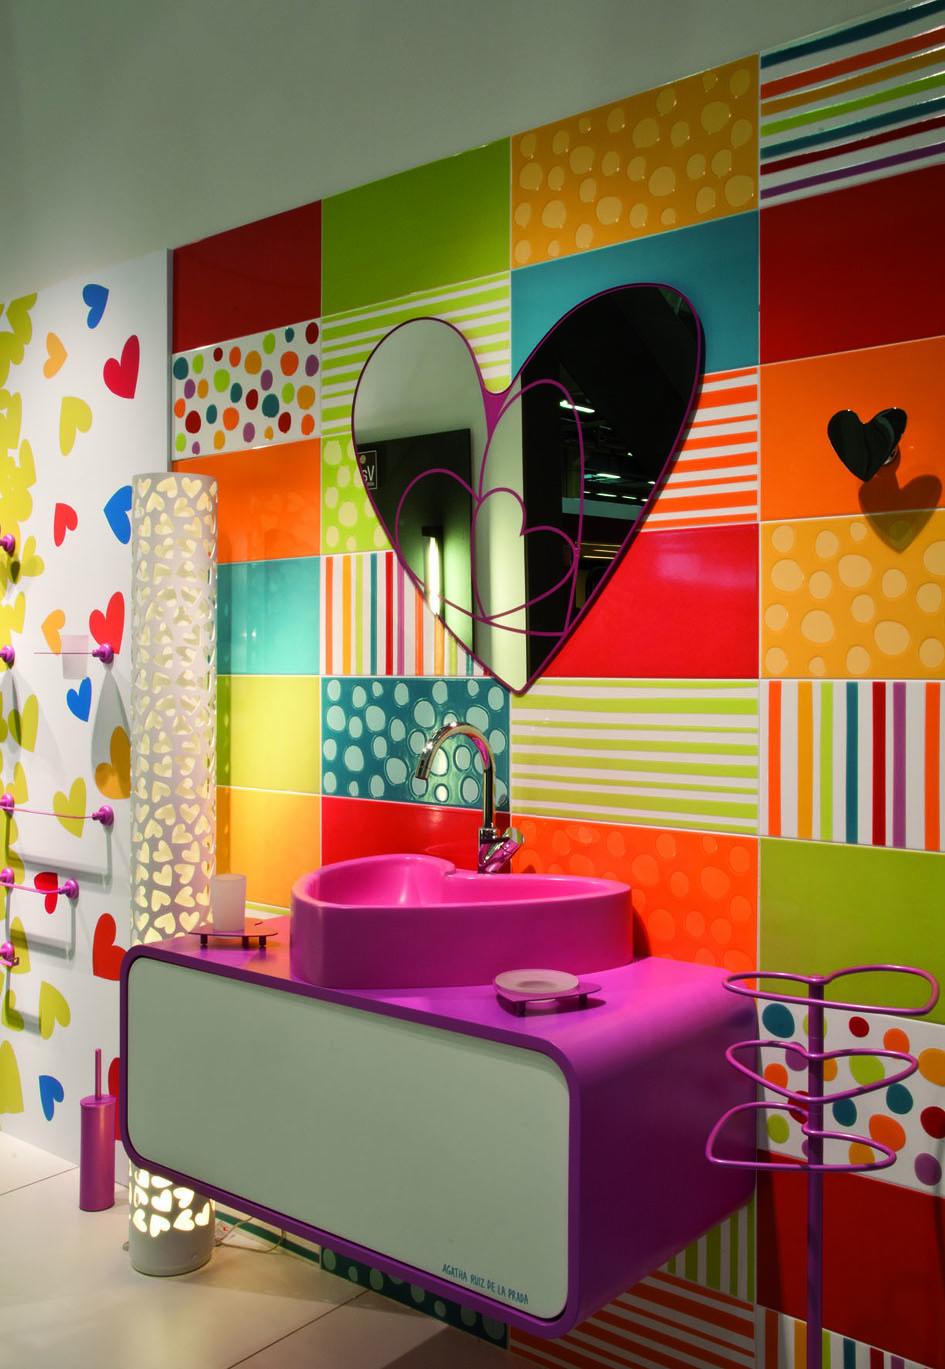 ambientul lunii mai blogul romstal. Black Bedroom Furniture Sets. Home Design Ideas